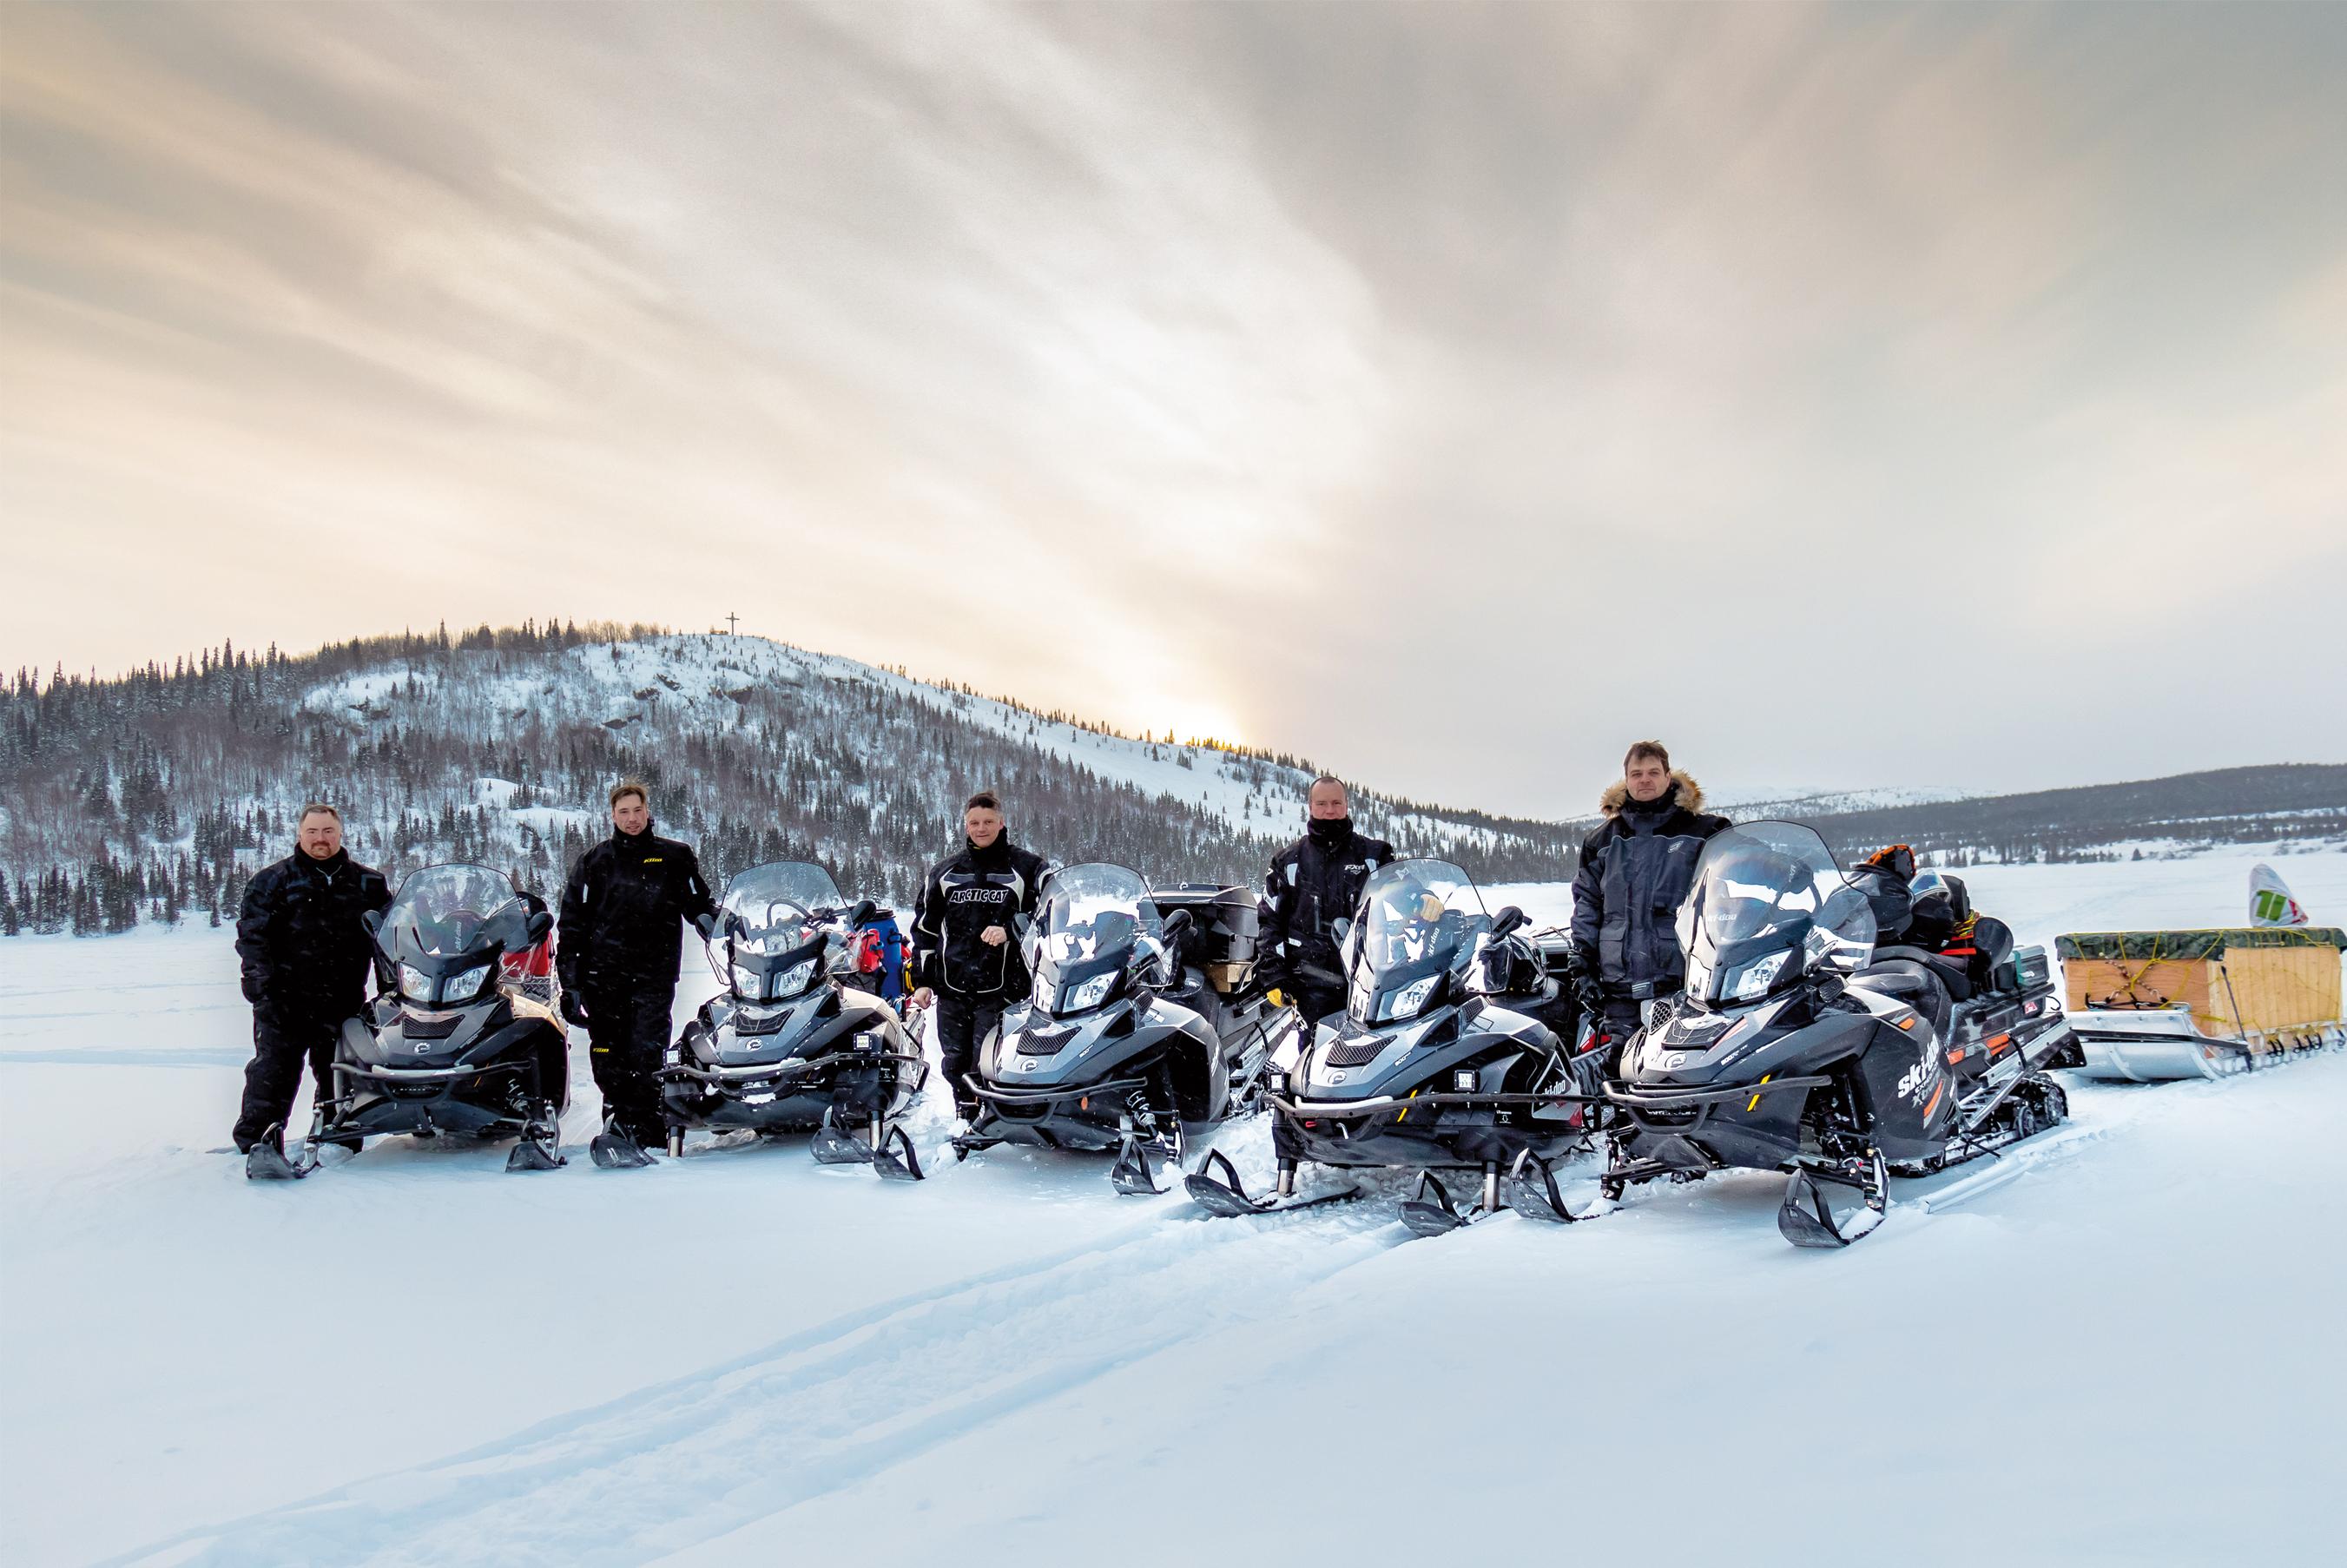 Grande aventure nordique vers le Nunavik